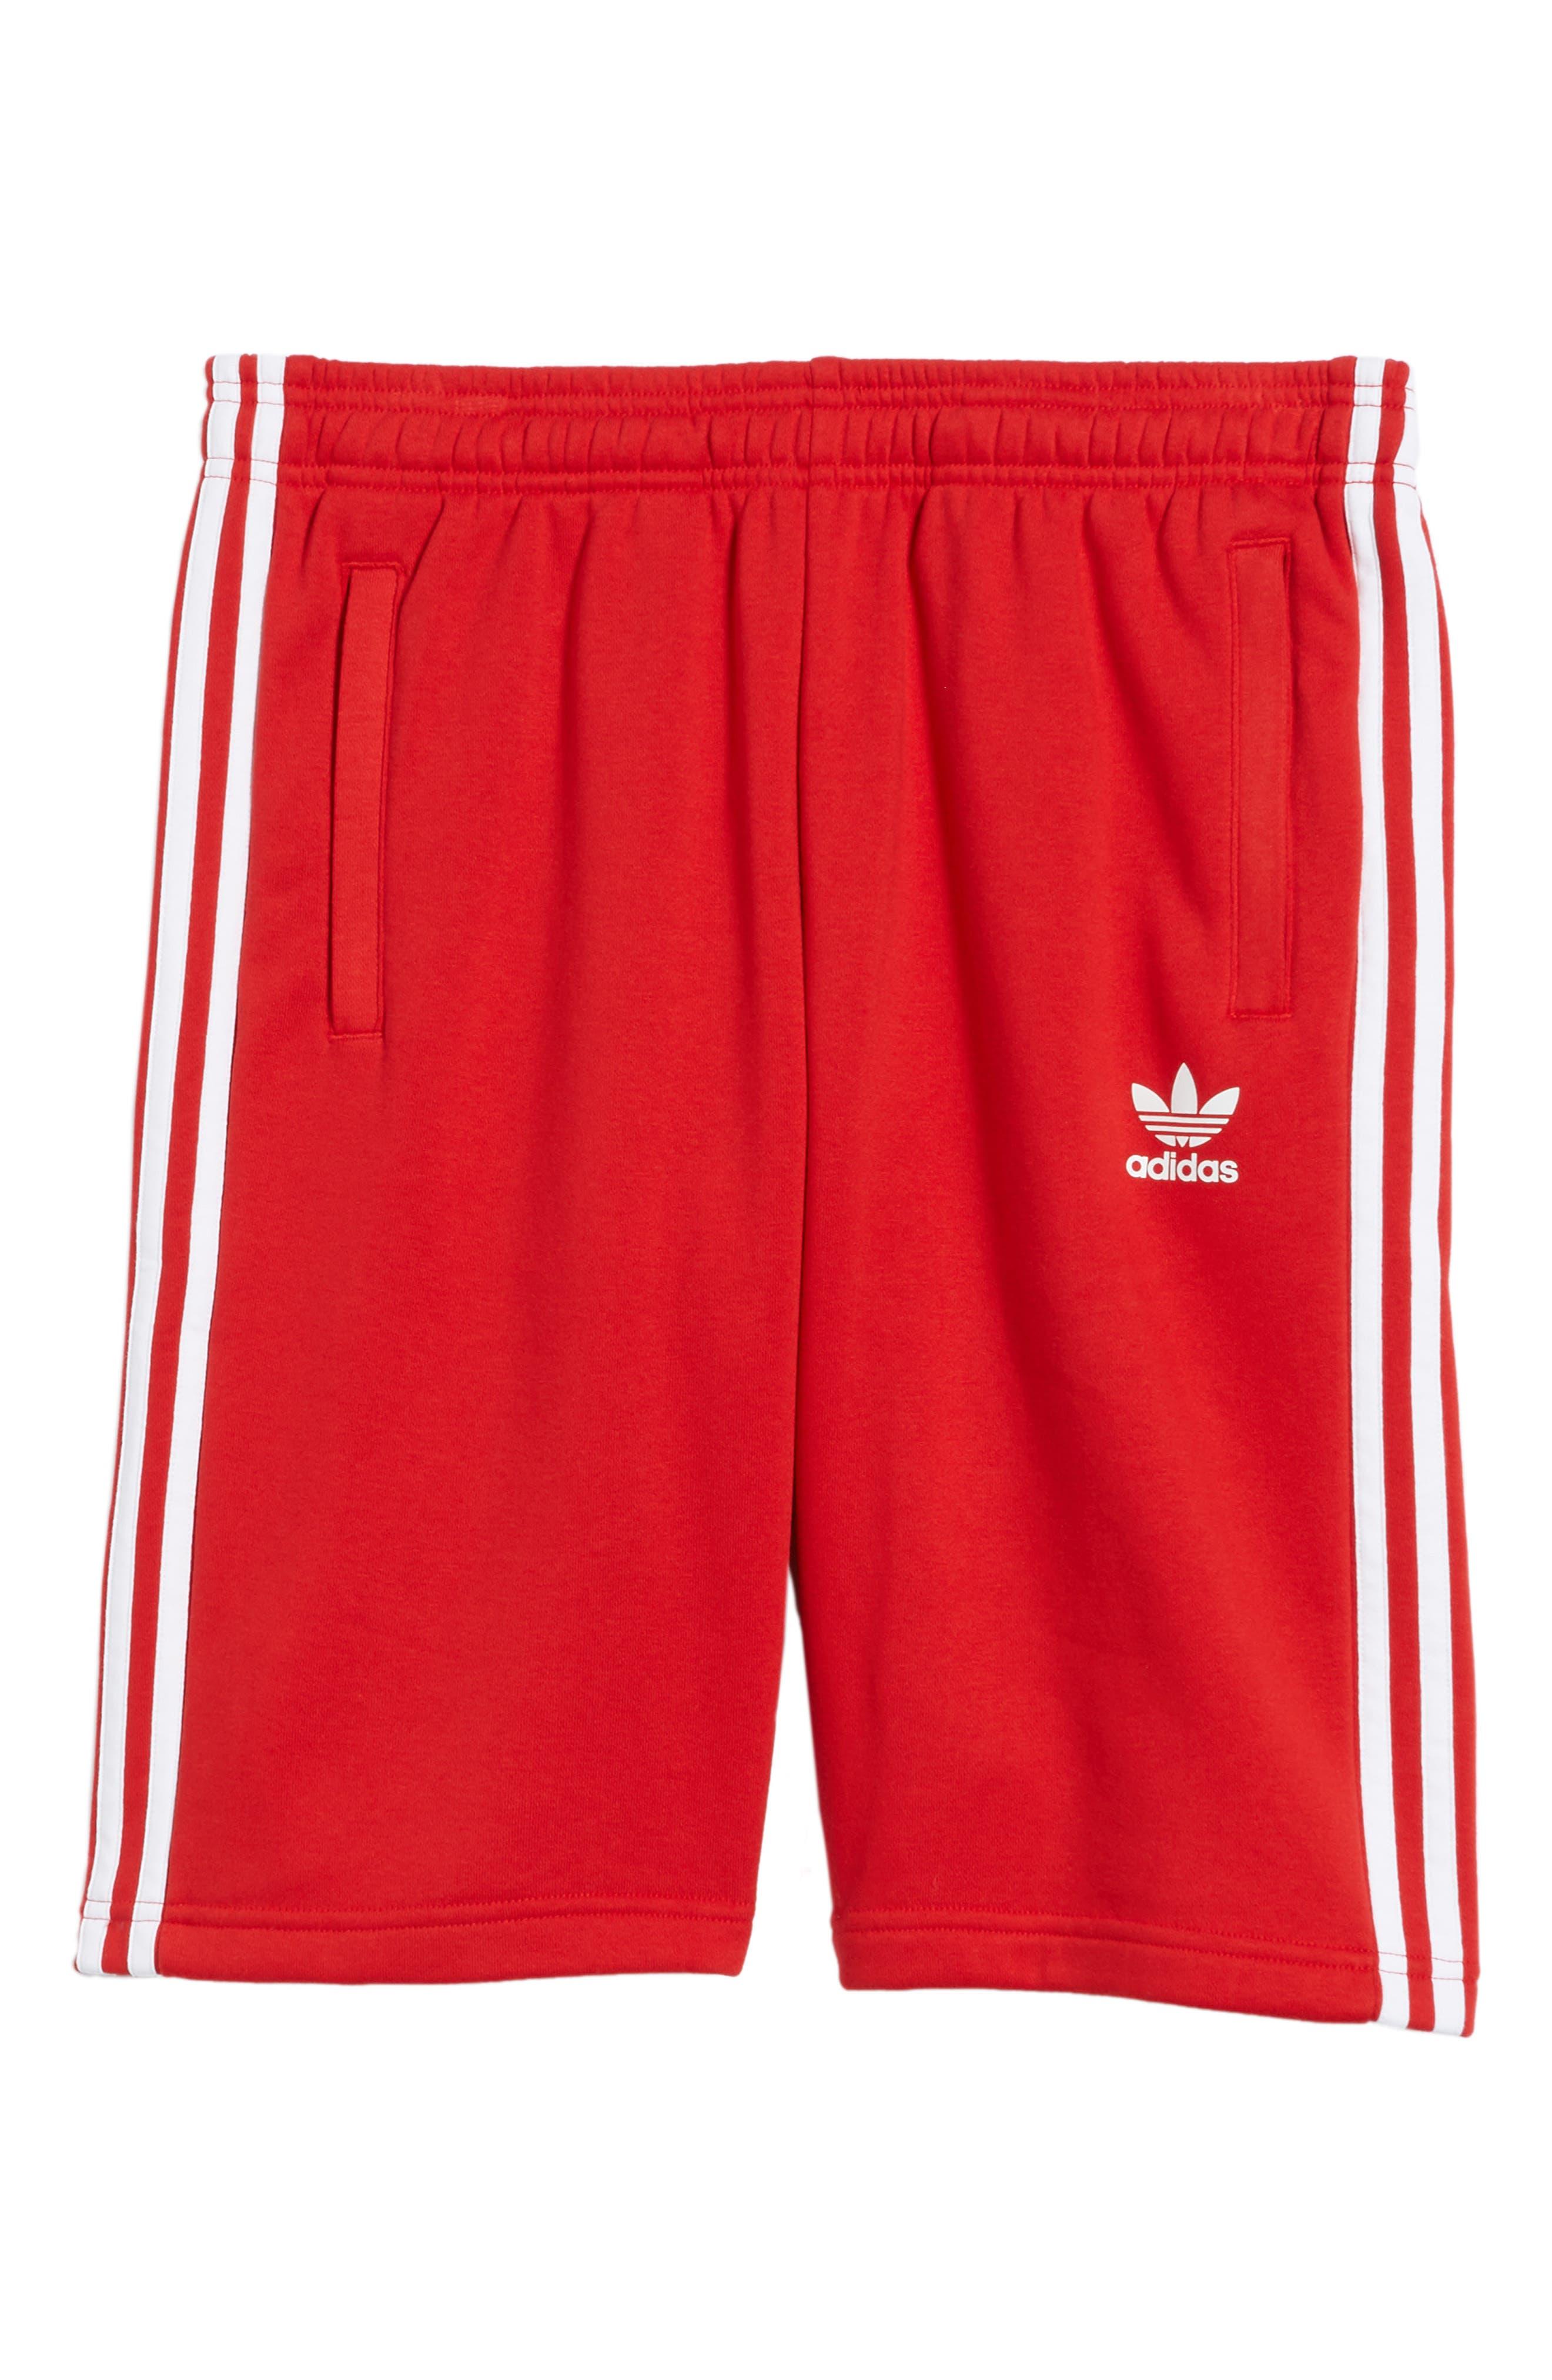 3-Stripes Shorts,                             Alternate thumbnail 6, color,                             Red/ White